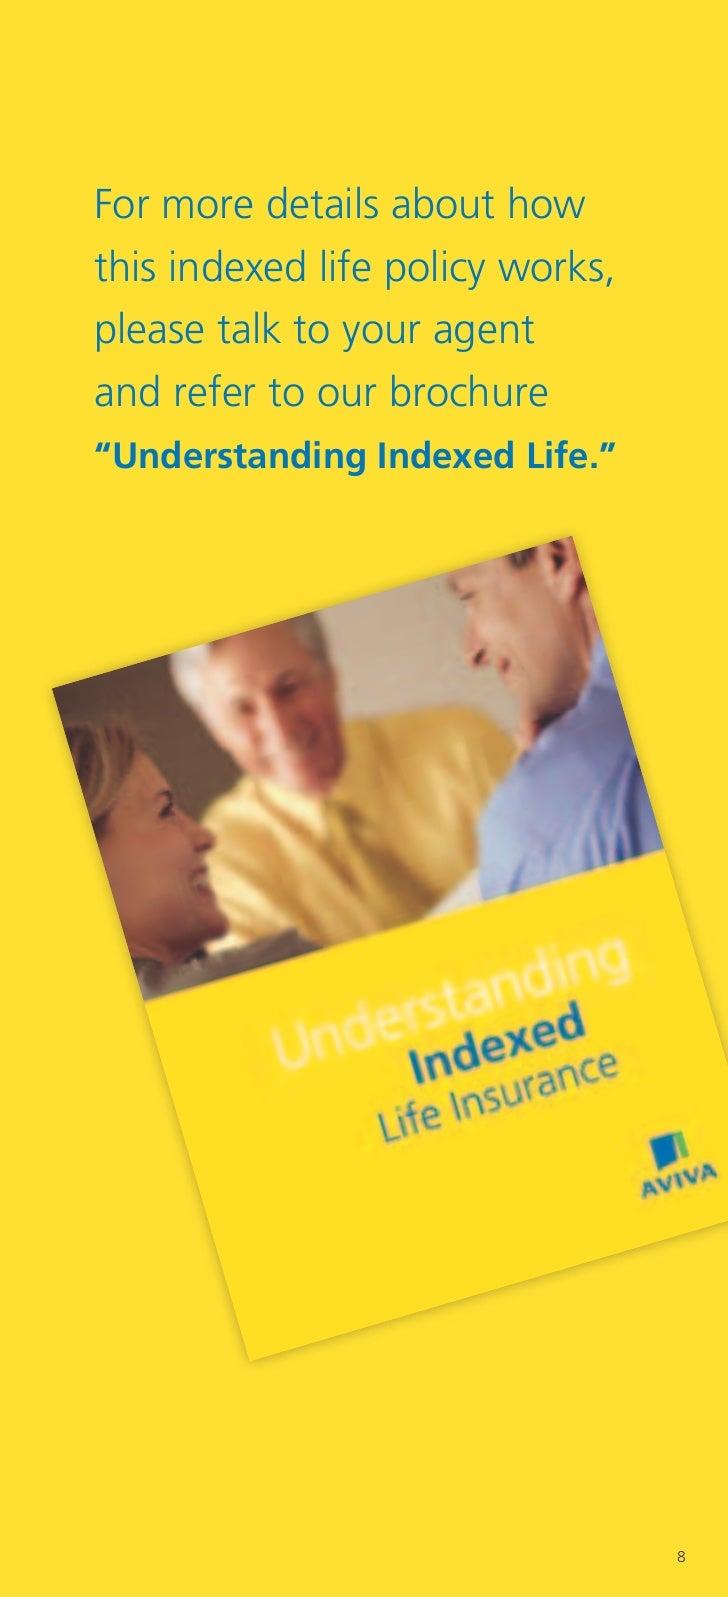 Survivor universal life insurance 4088541883 san jose ...